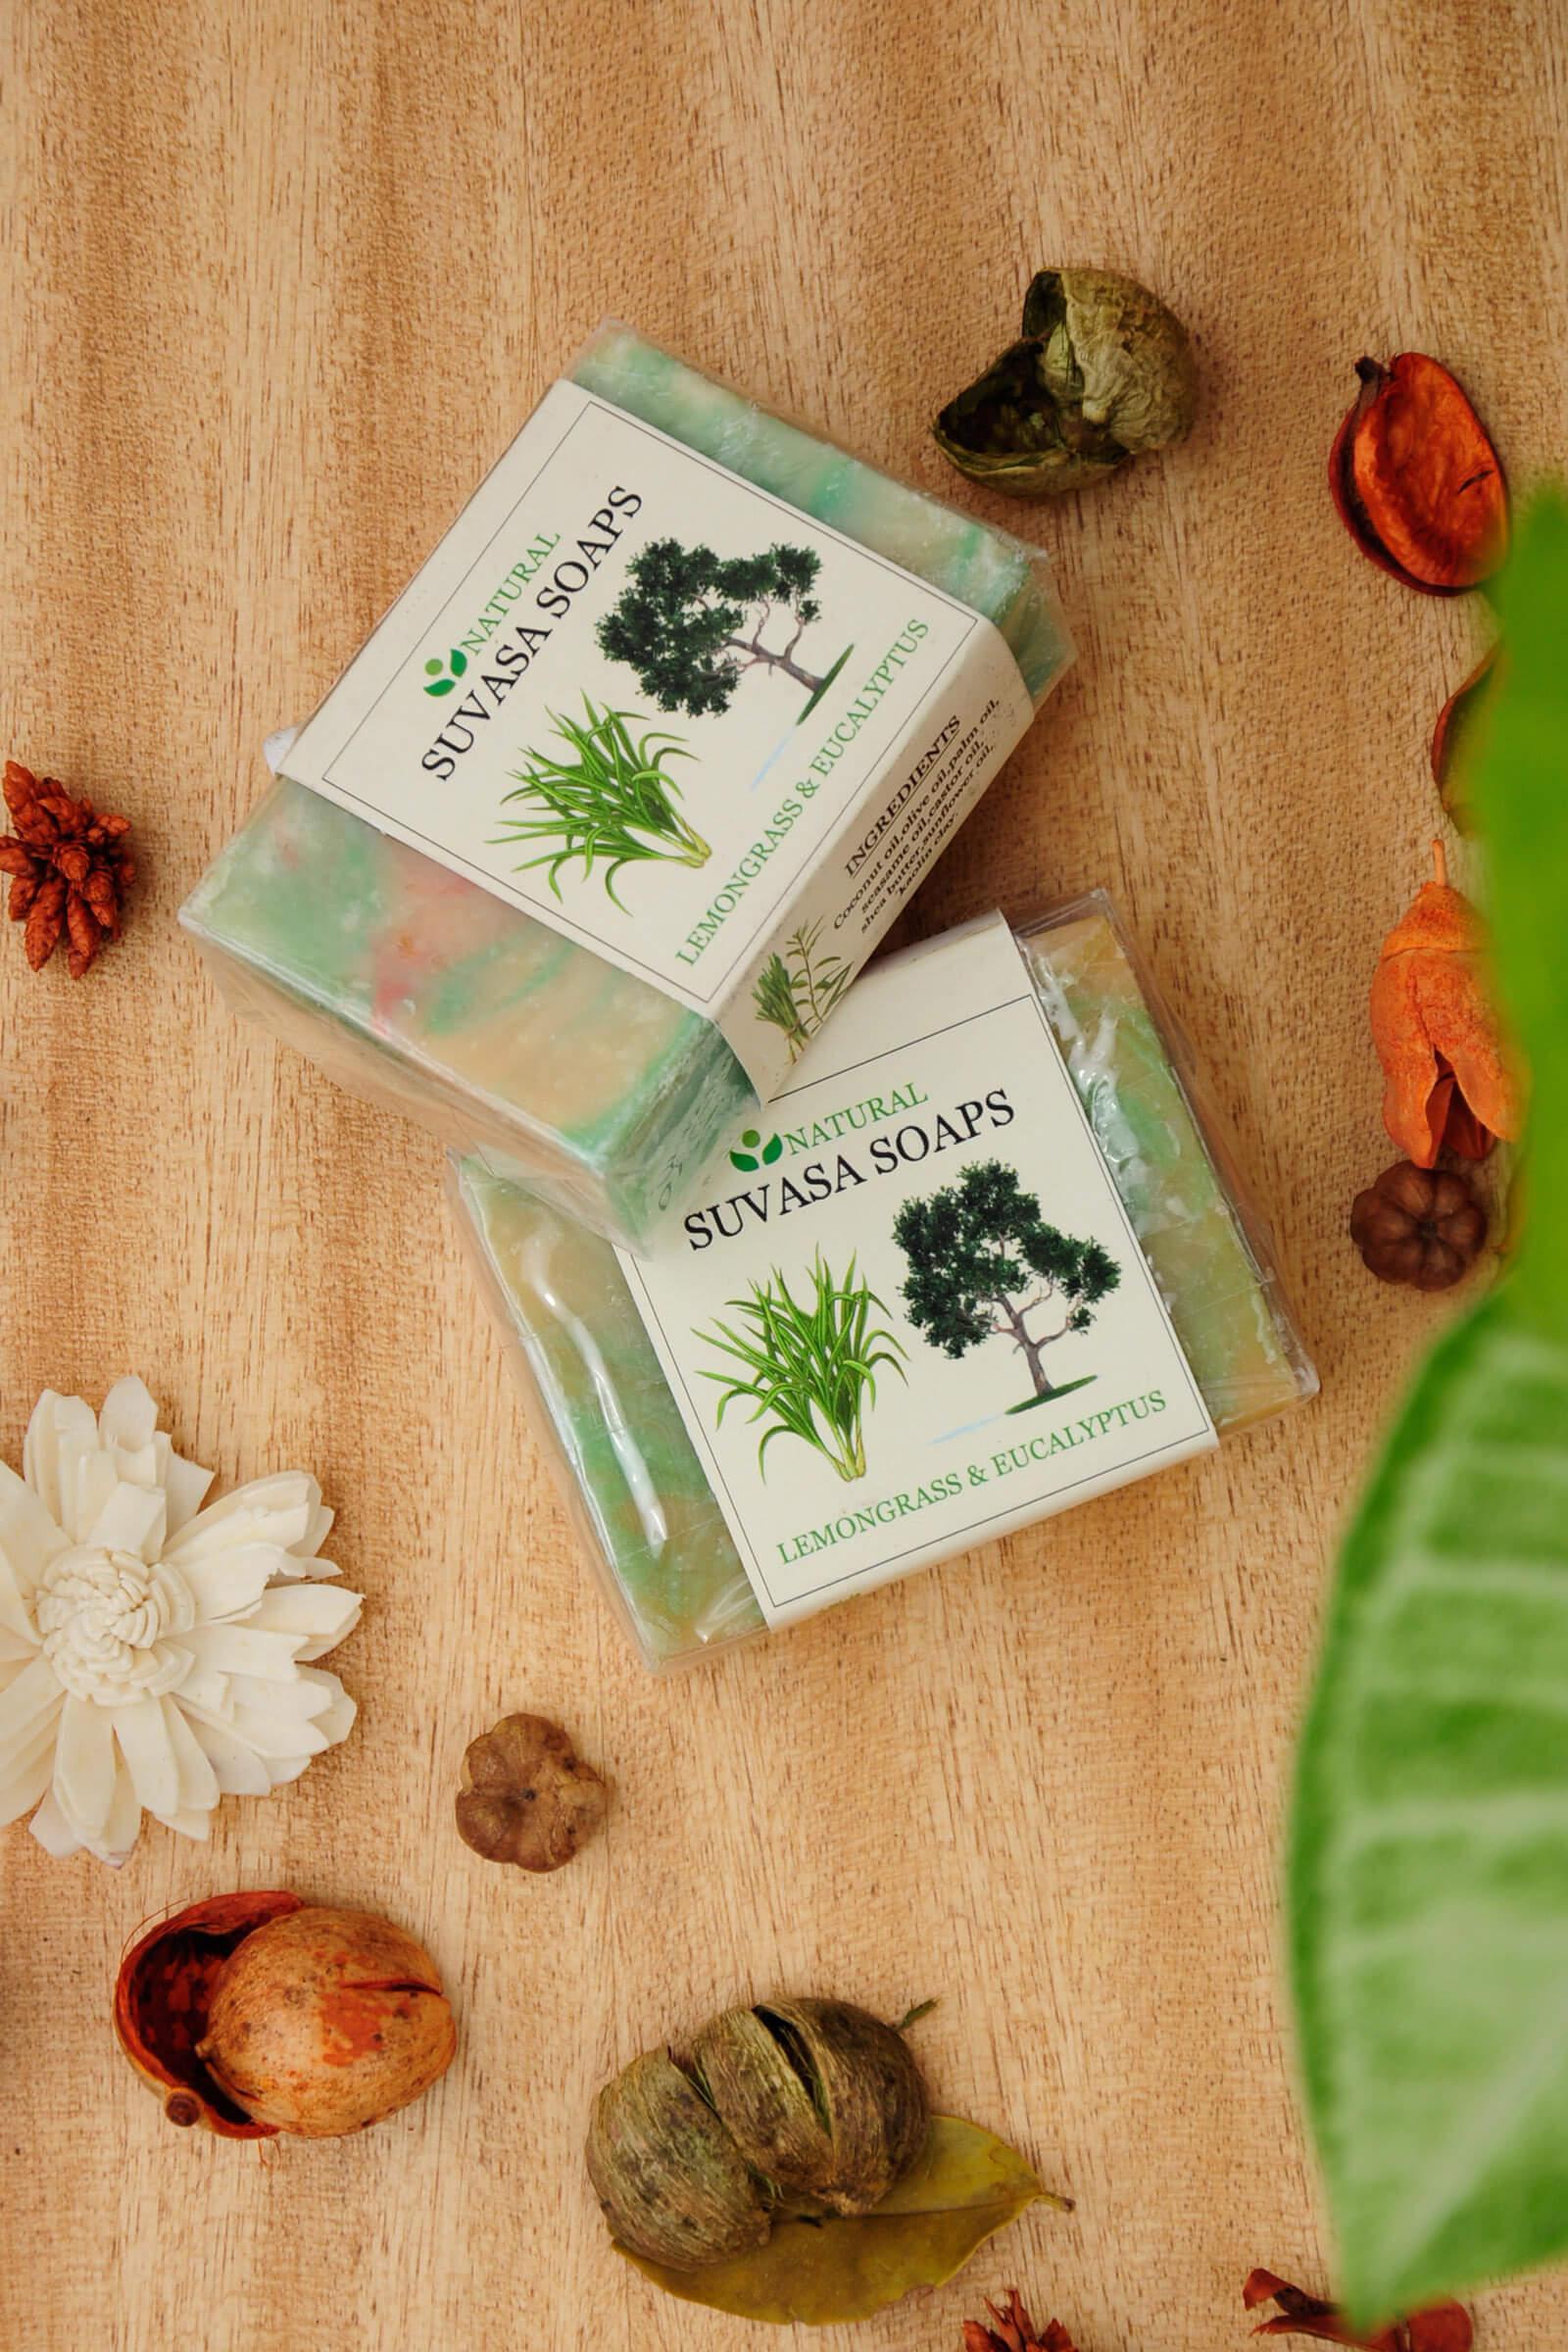 Lemongrass & Eucalyptus